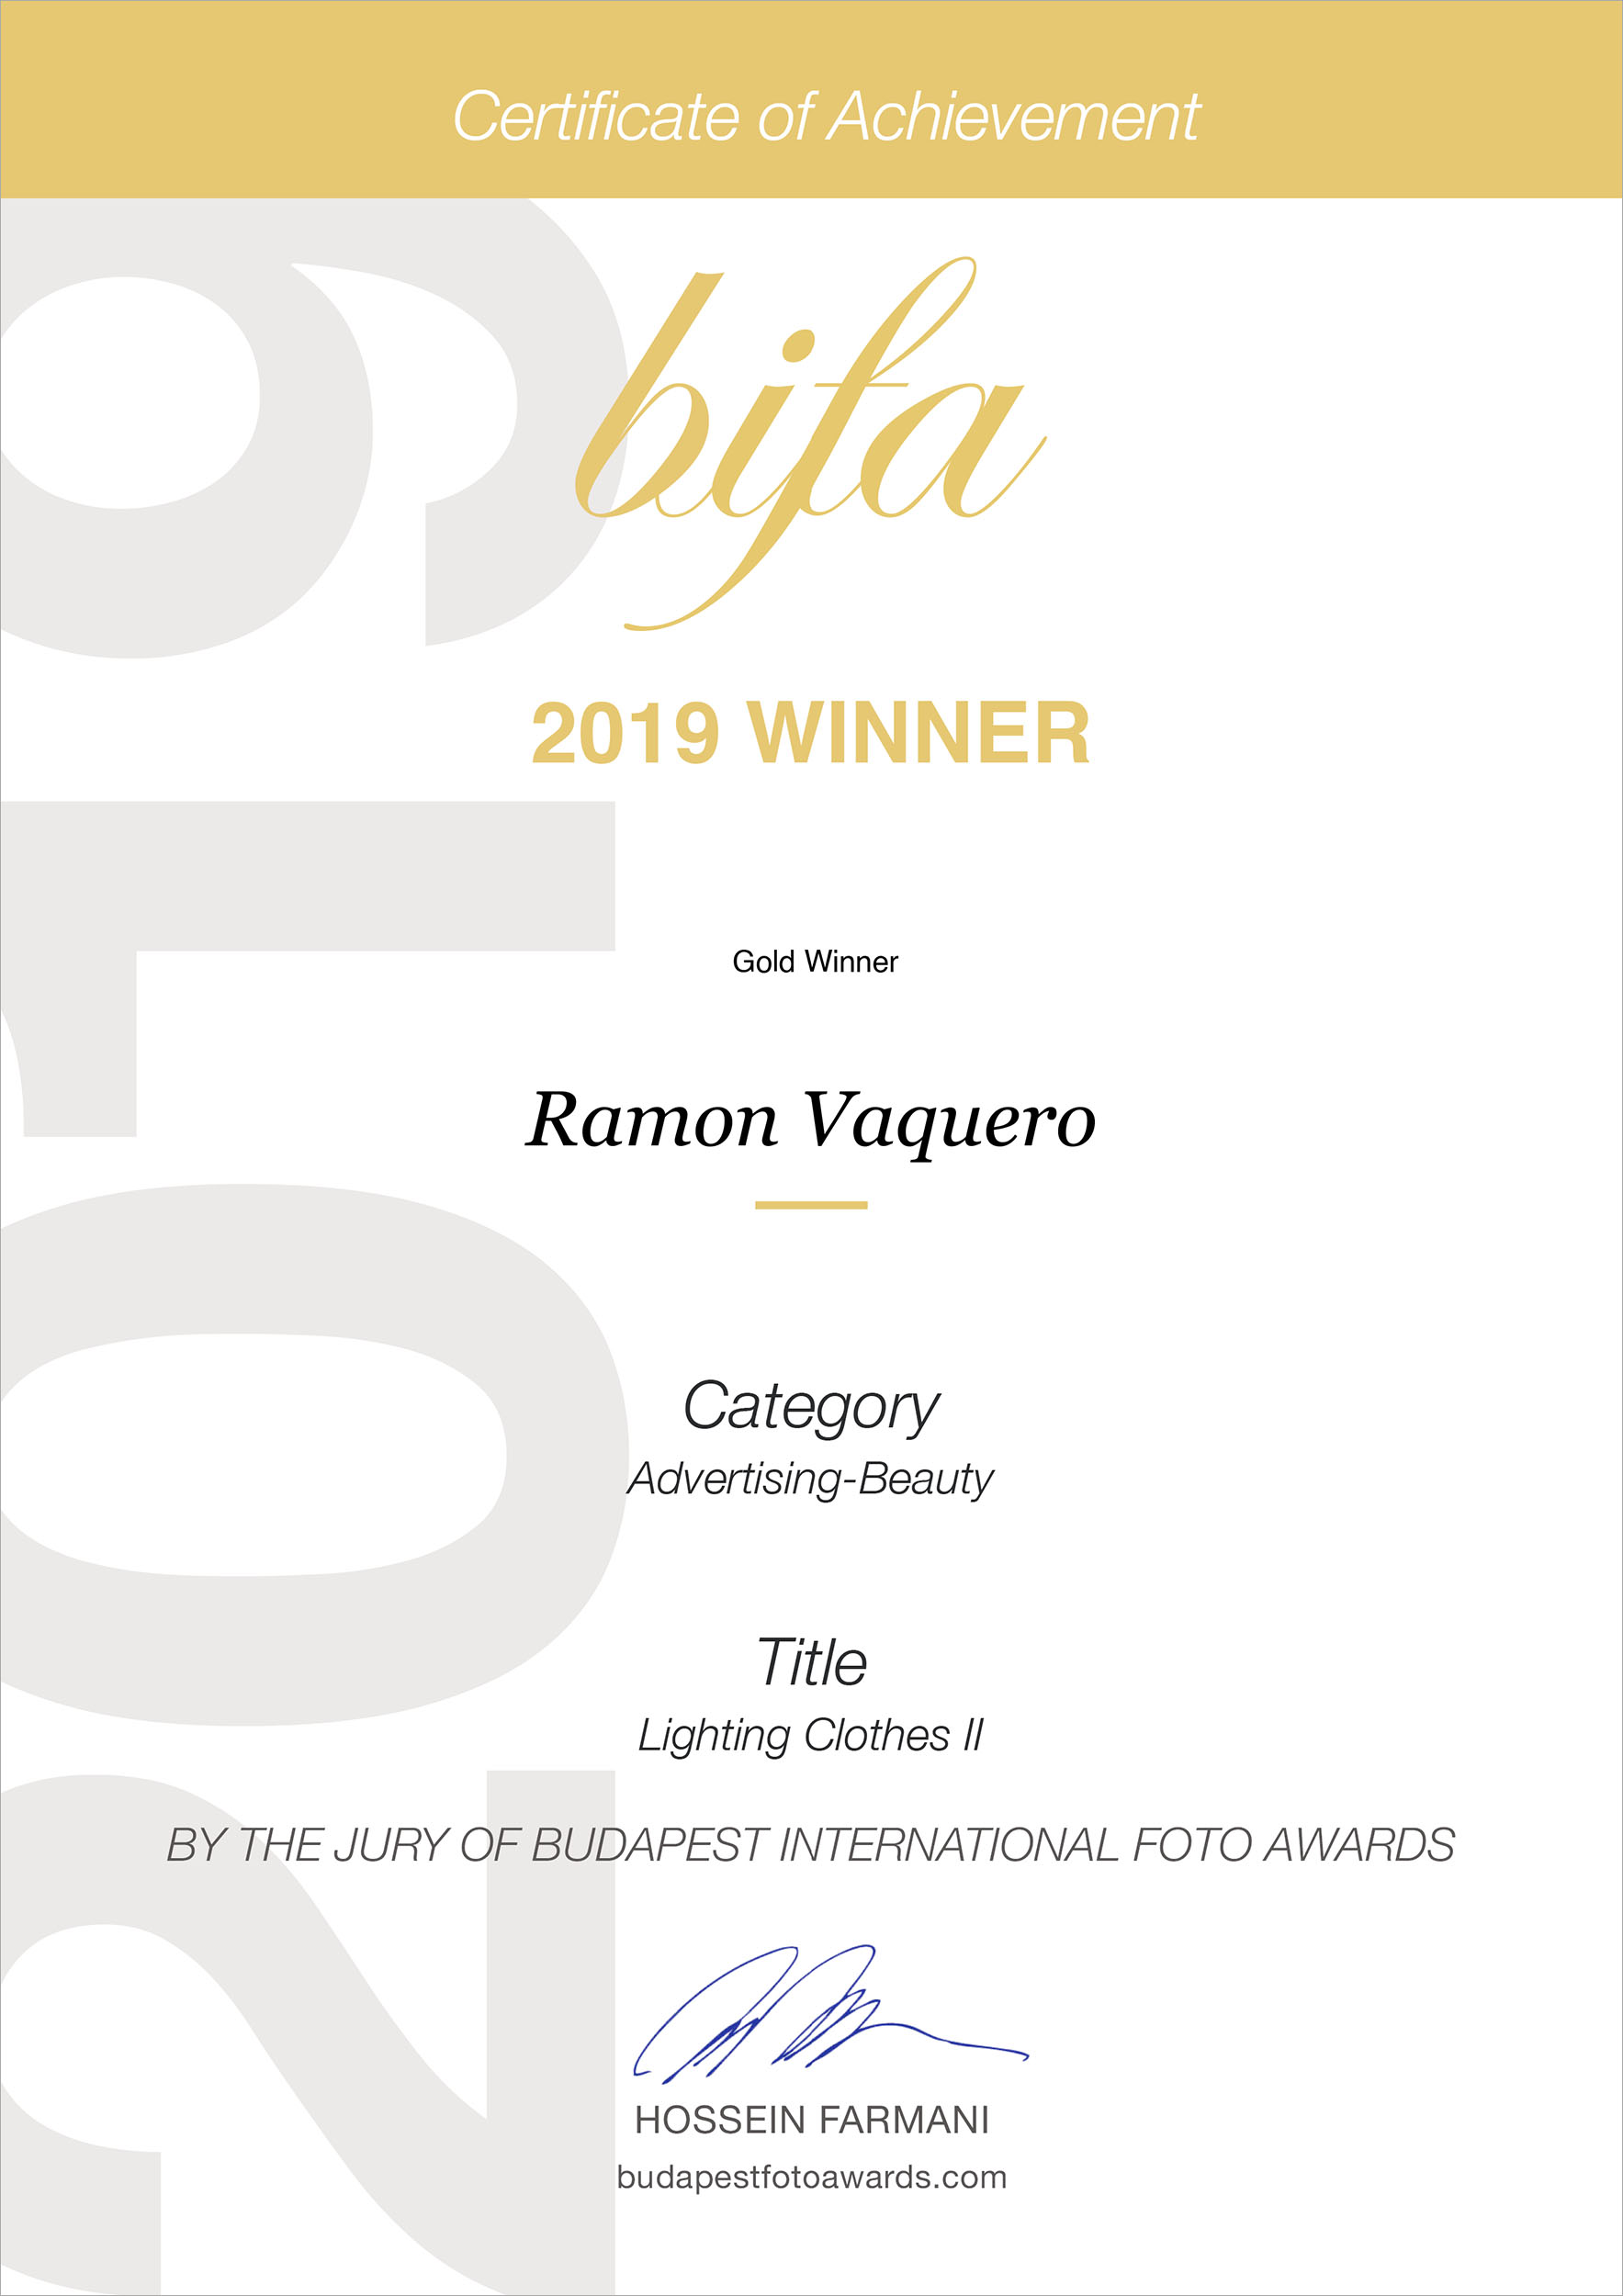 ramon-vaquero_budapest-foto-awards_vigo